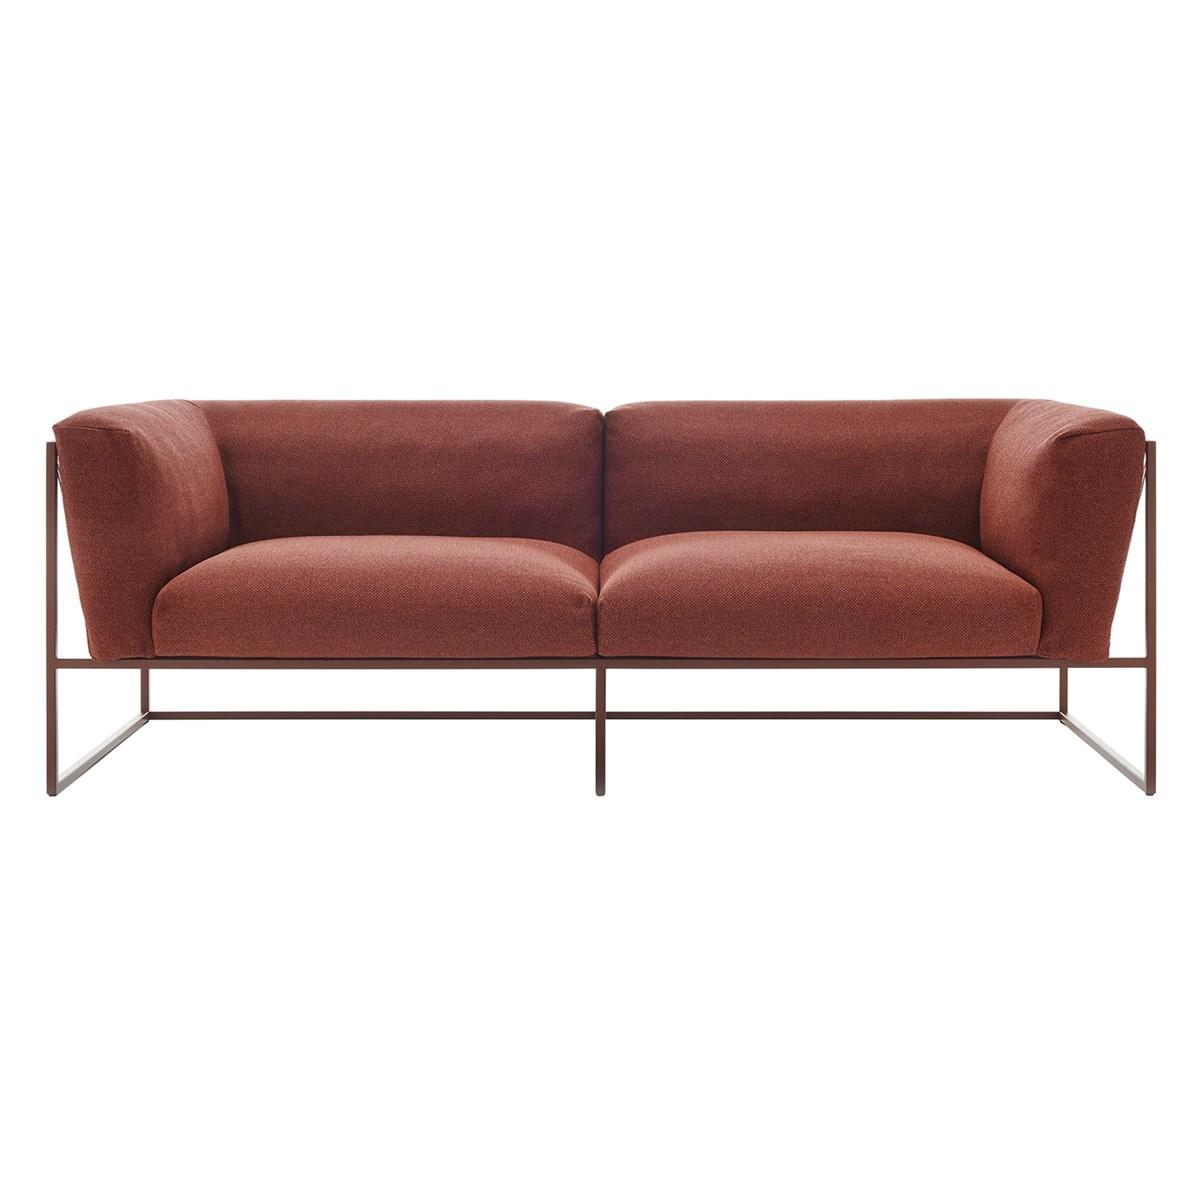 MDF-Italia-Ramón-Esteve-Arpa-Sofa-Matisse-1